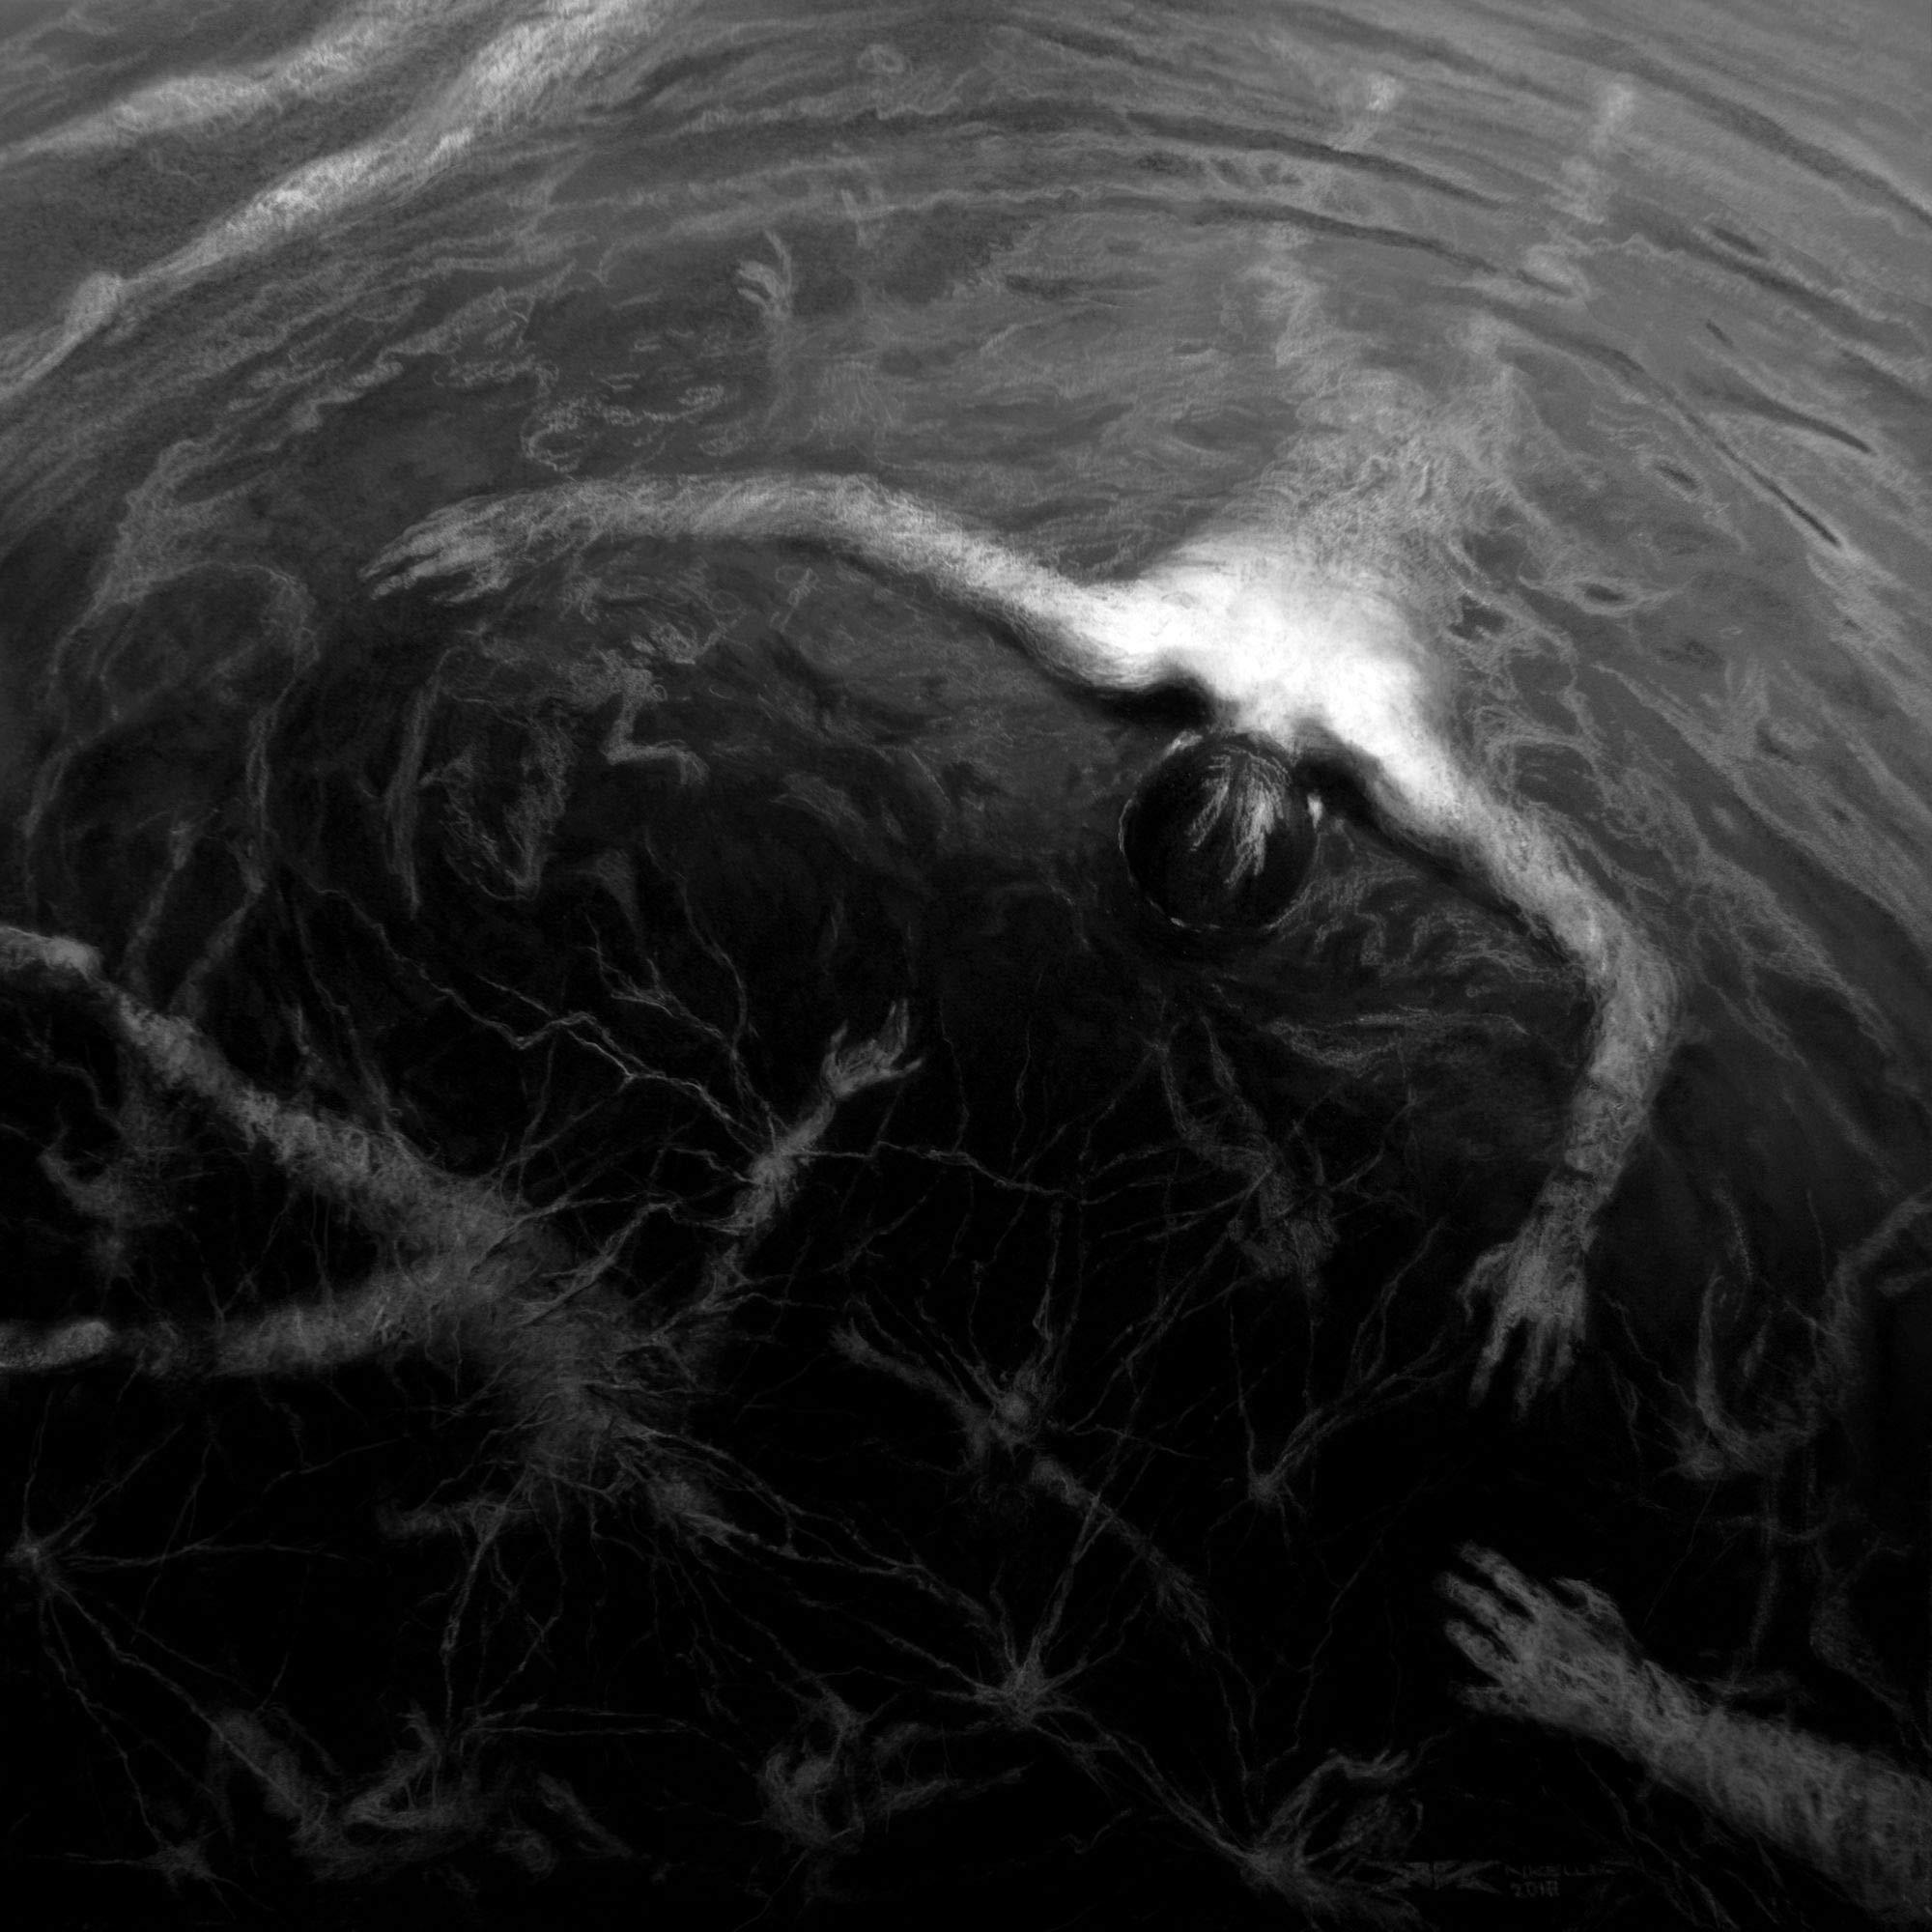 Vinilo : Altarage - Approaching Roar (LP Vinyl)